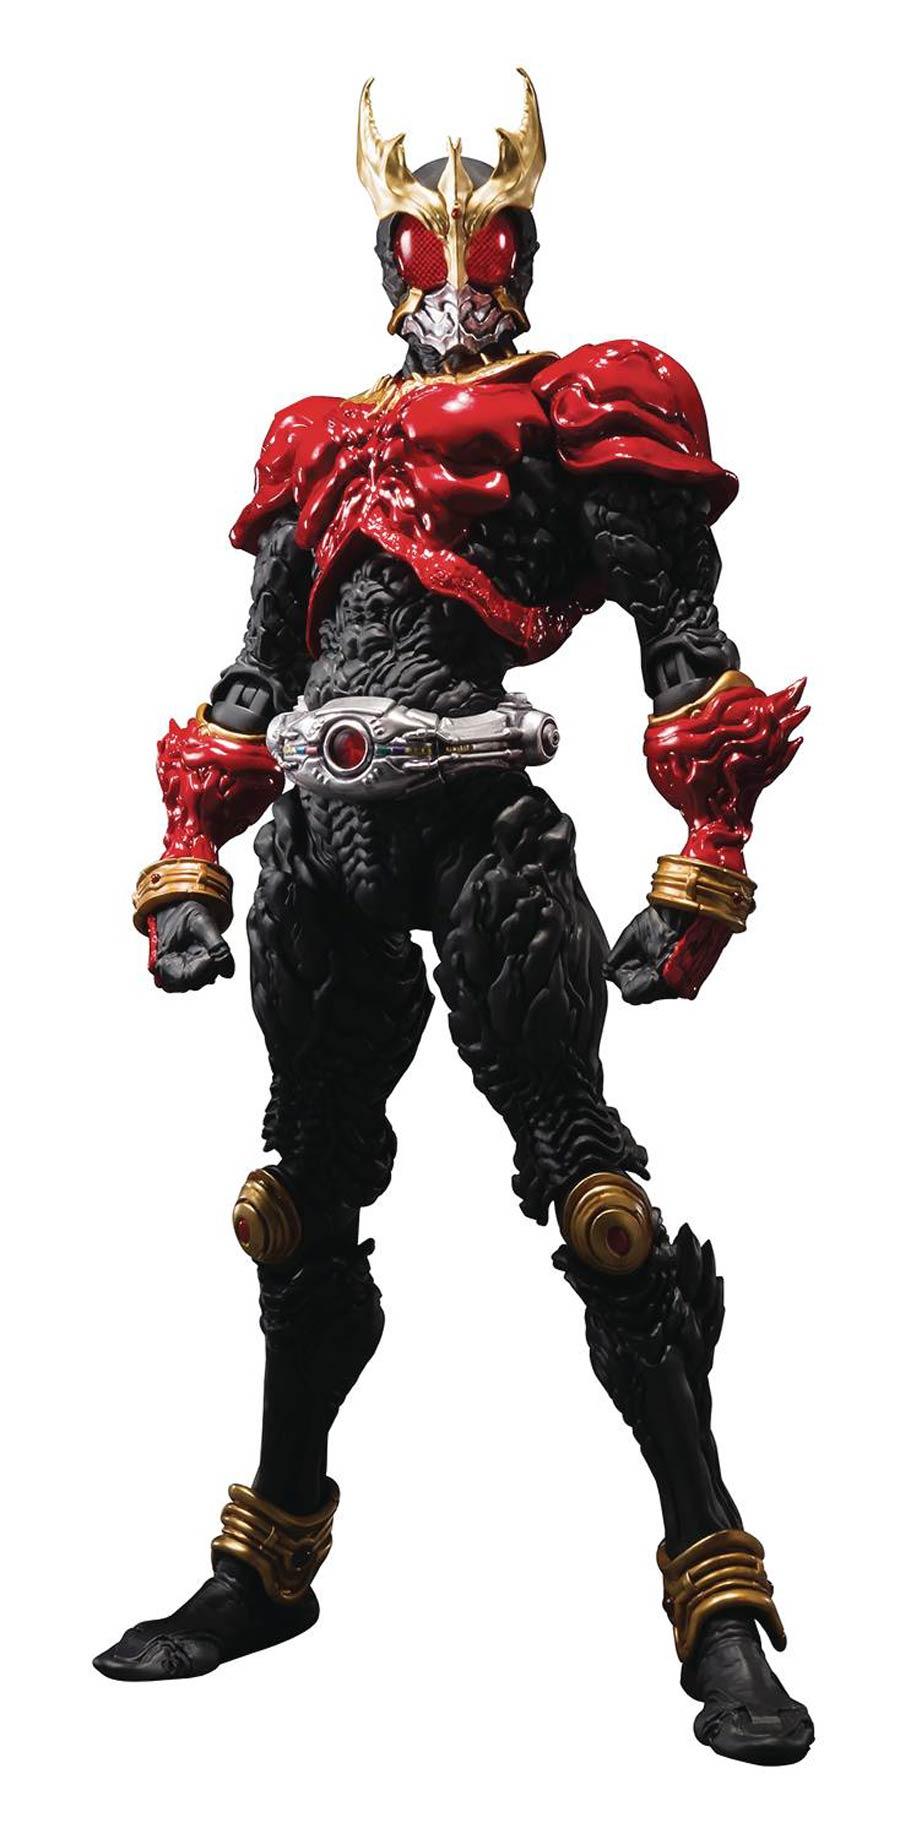 Kamen Rider S.I.C. Super Imaginative Colosseum - Masked Rider Kuuga Action Figure